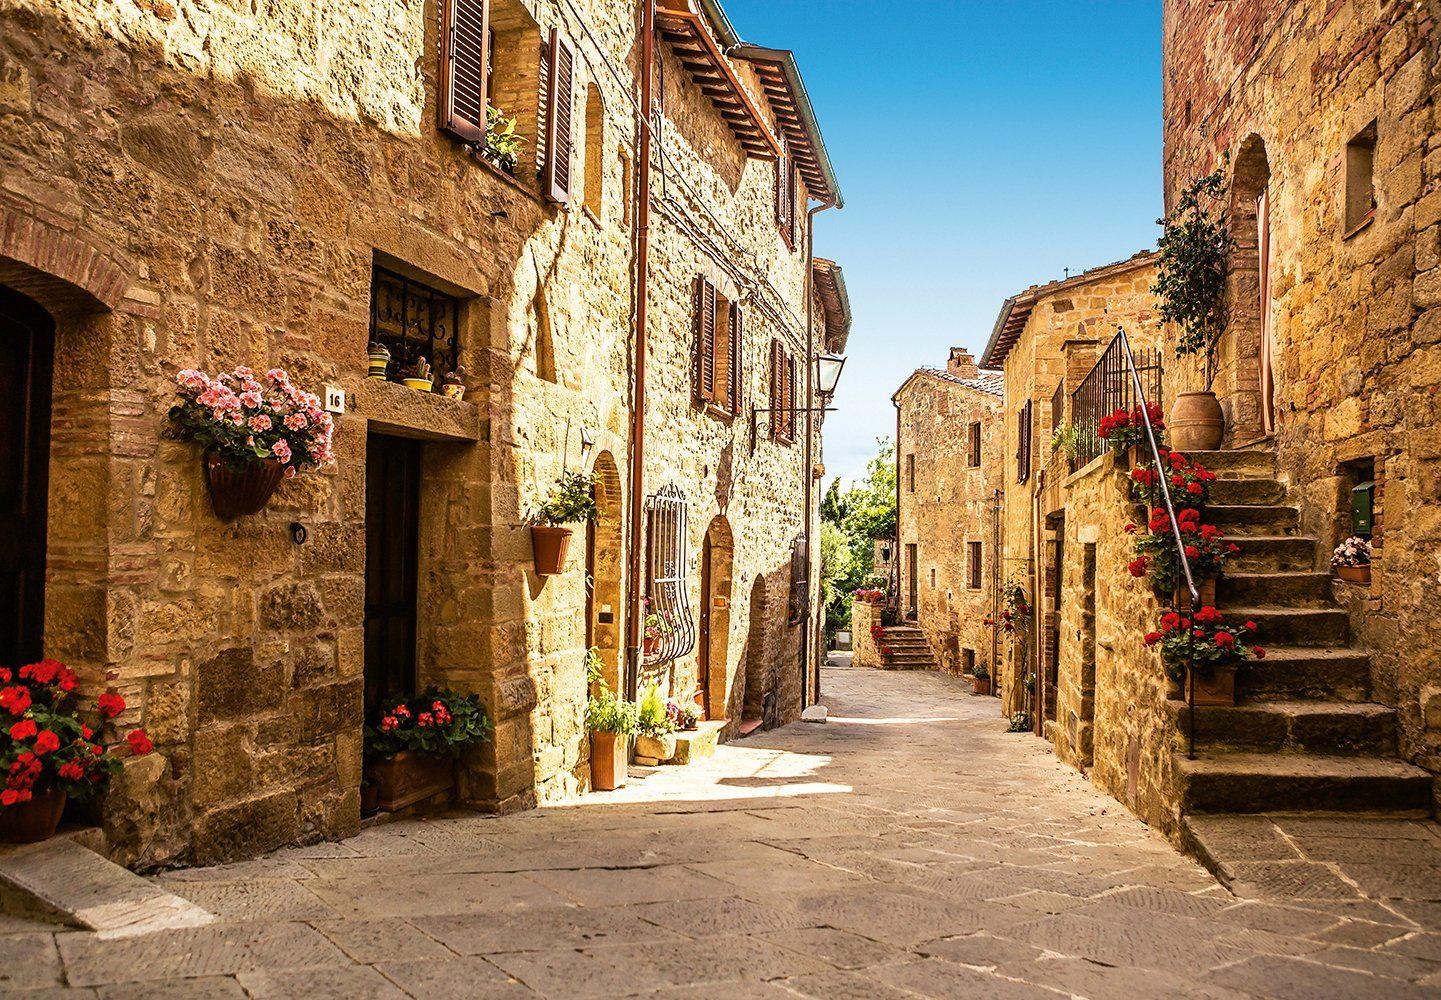 Fototapete »Tuscany Village«, 8-teilig, 366x254 cm